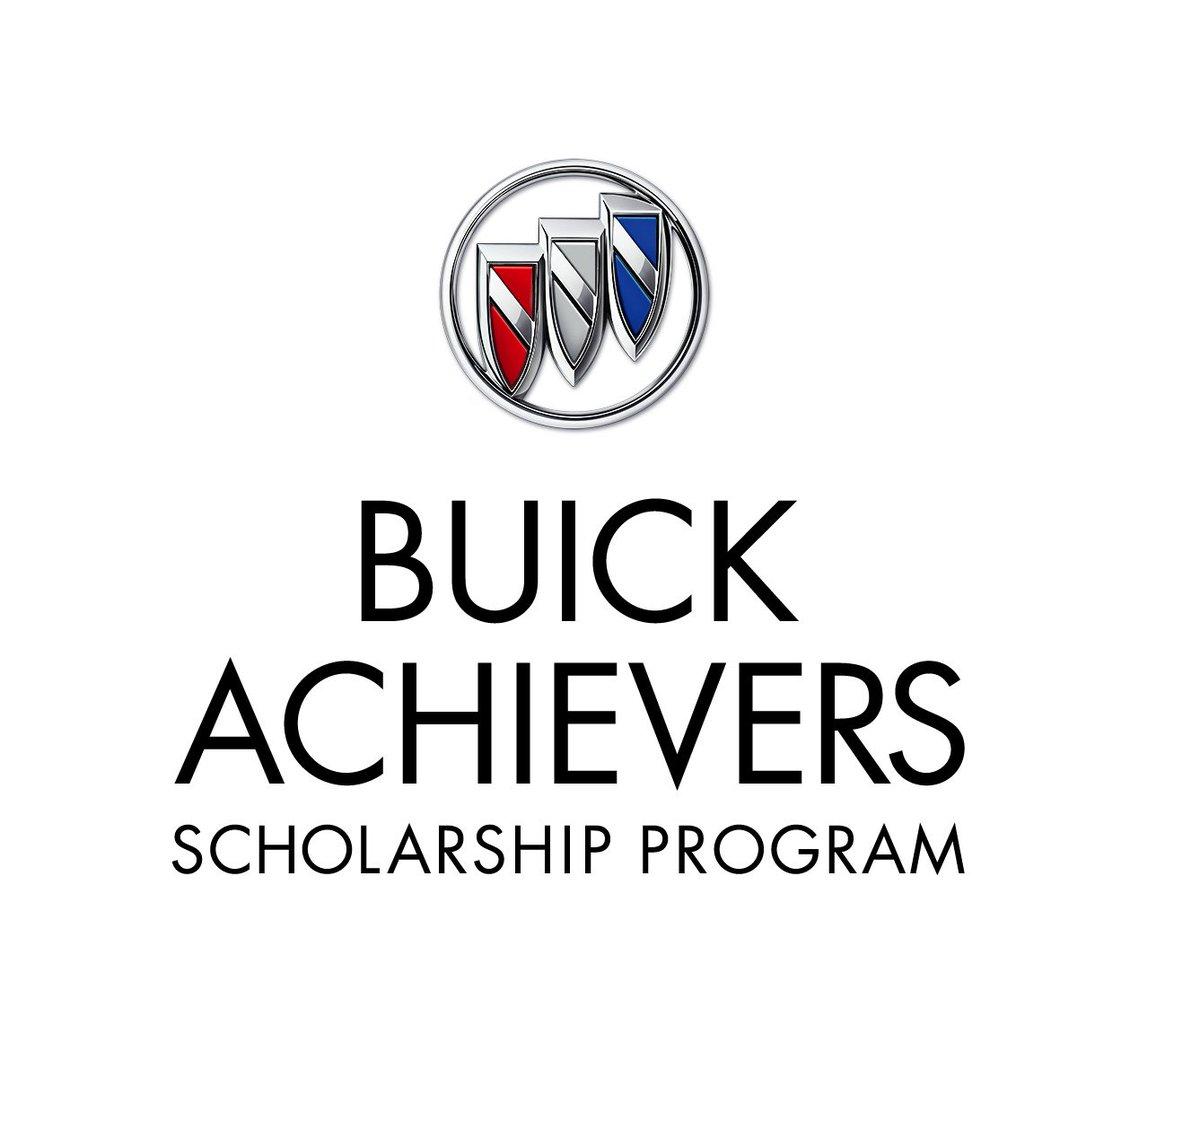 Buick Achievers Scholarship >> Patrick Paolucci On Twitter Mtbarra Gm Buick The Mini